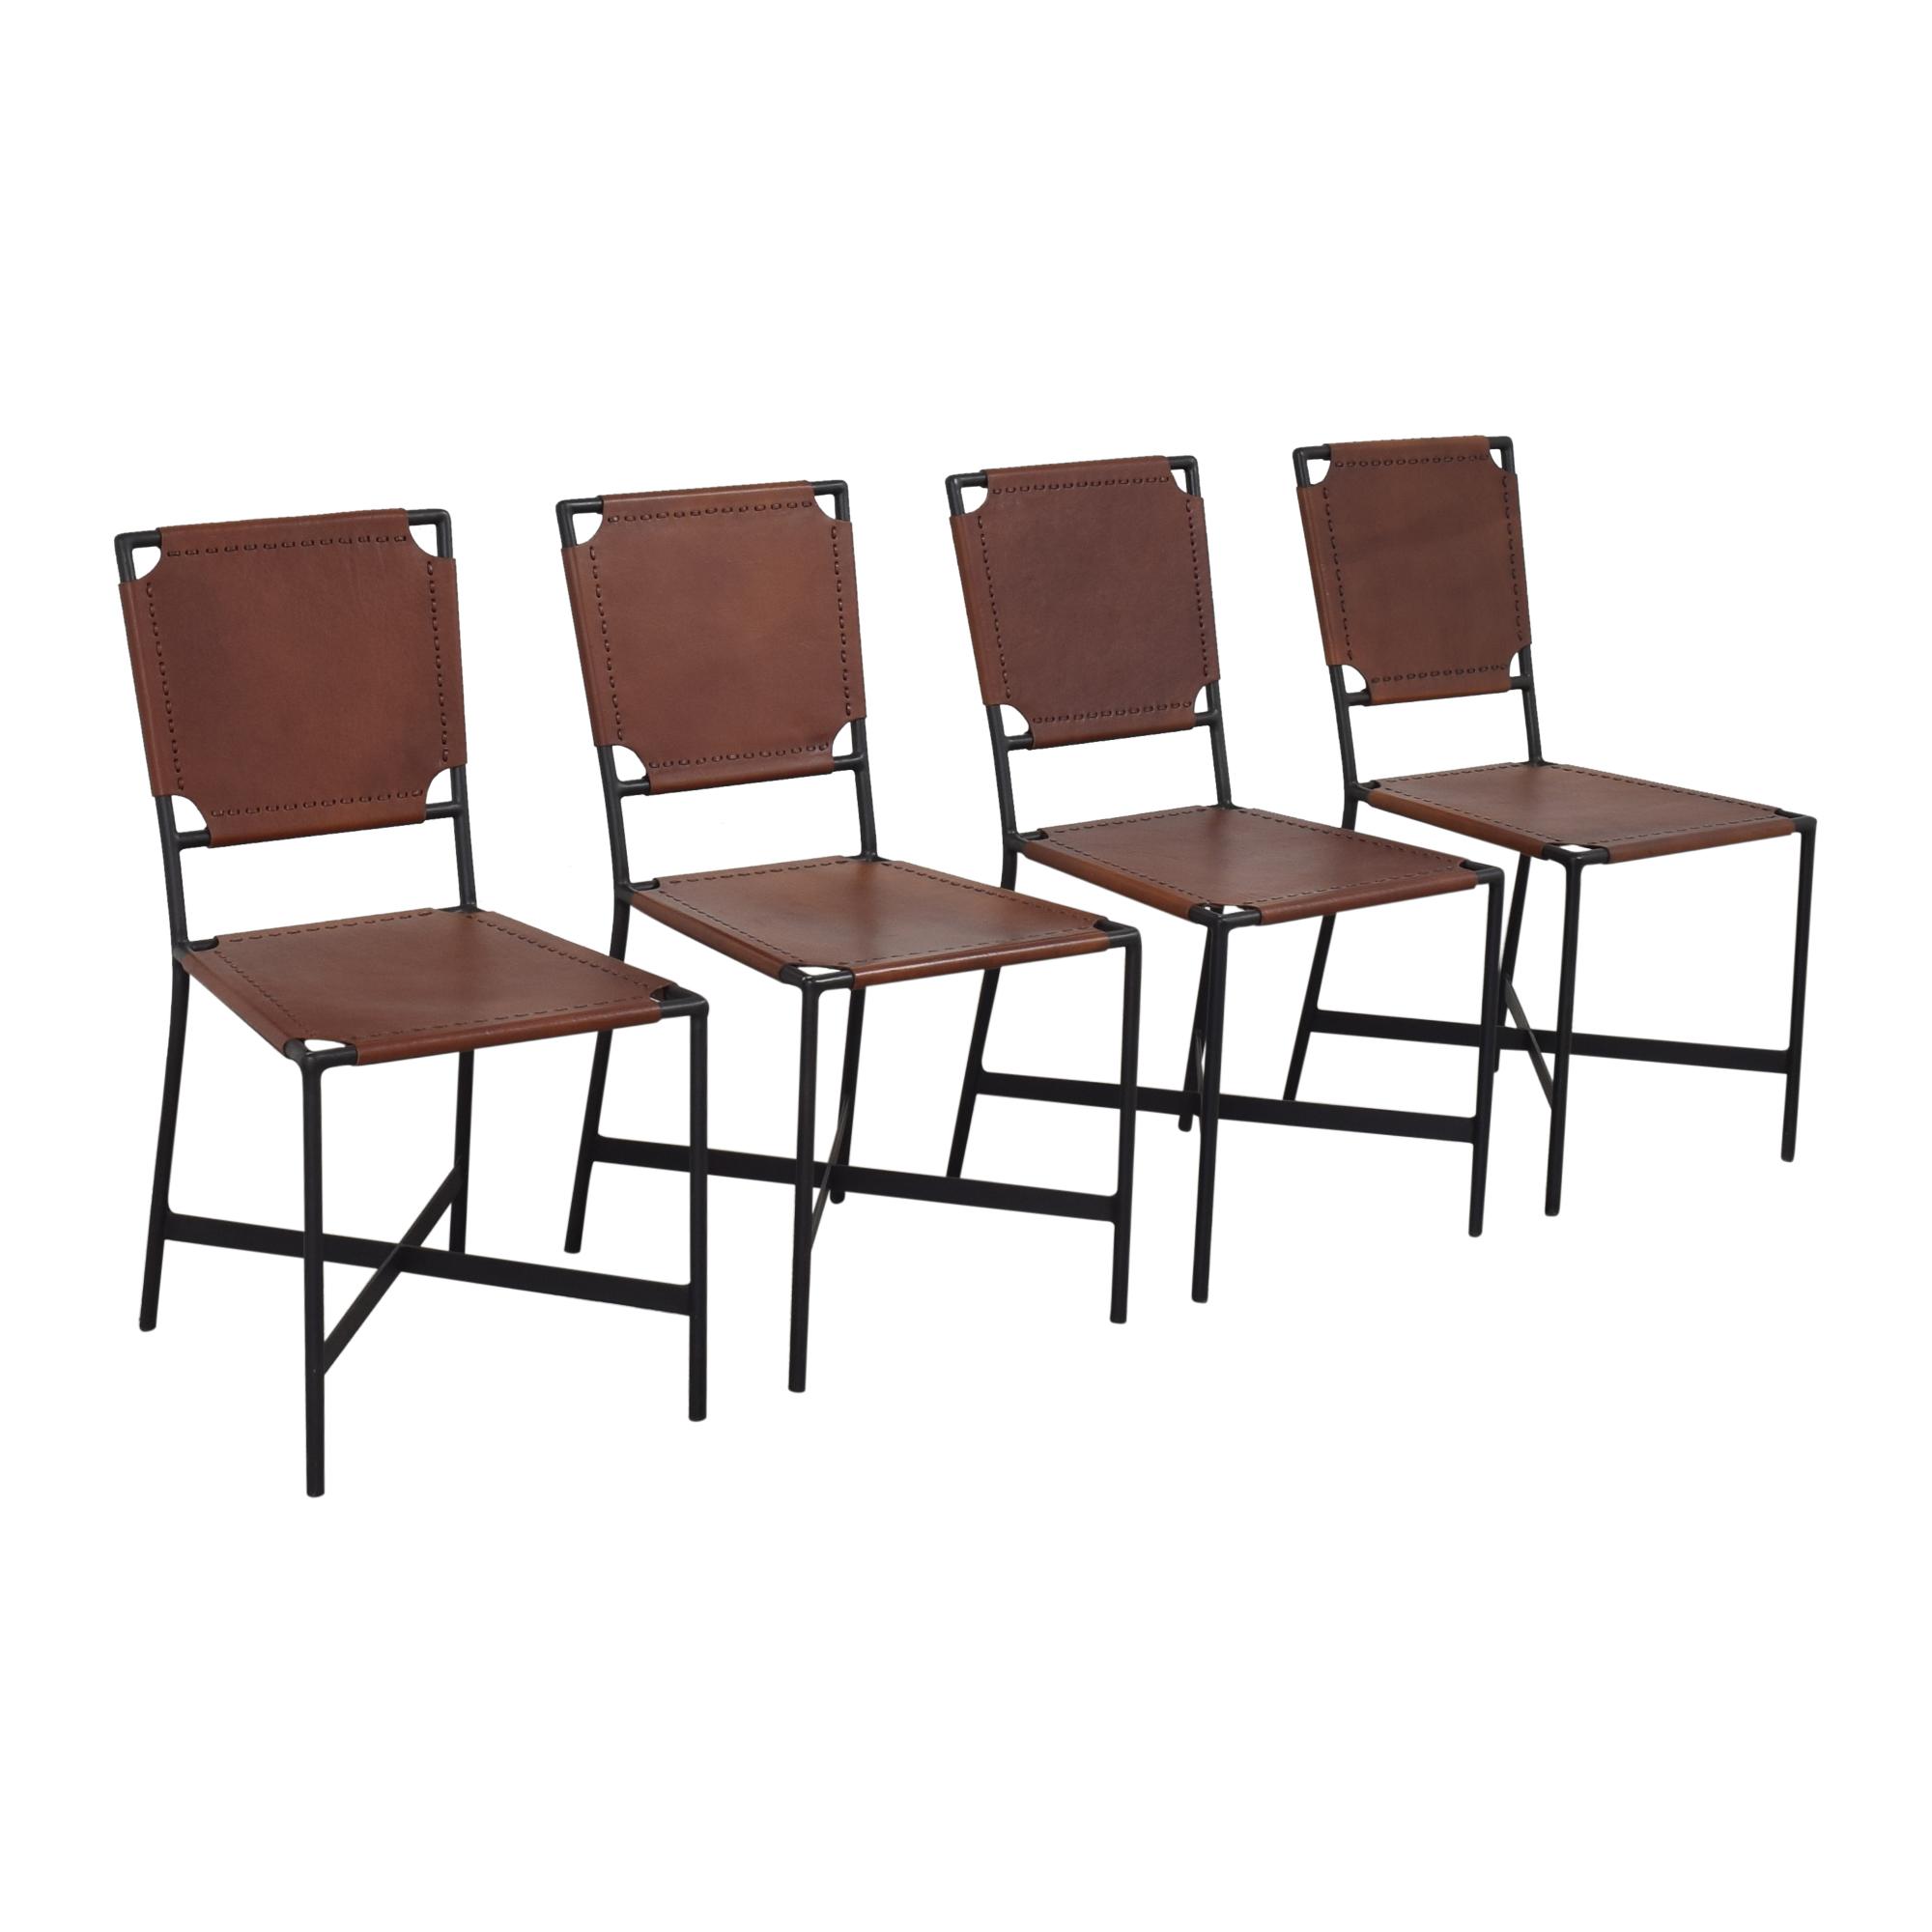 Crate & Barrel Laredo Dining Chairs Crate & Barrel